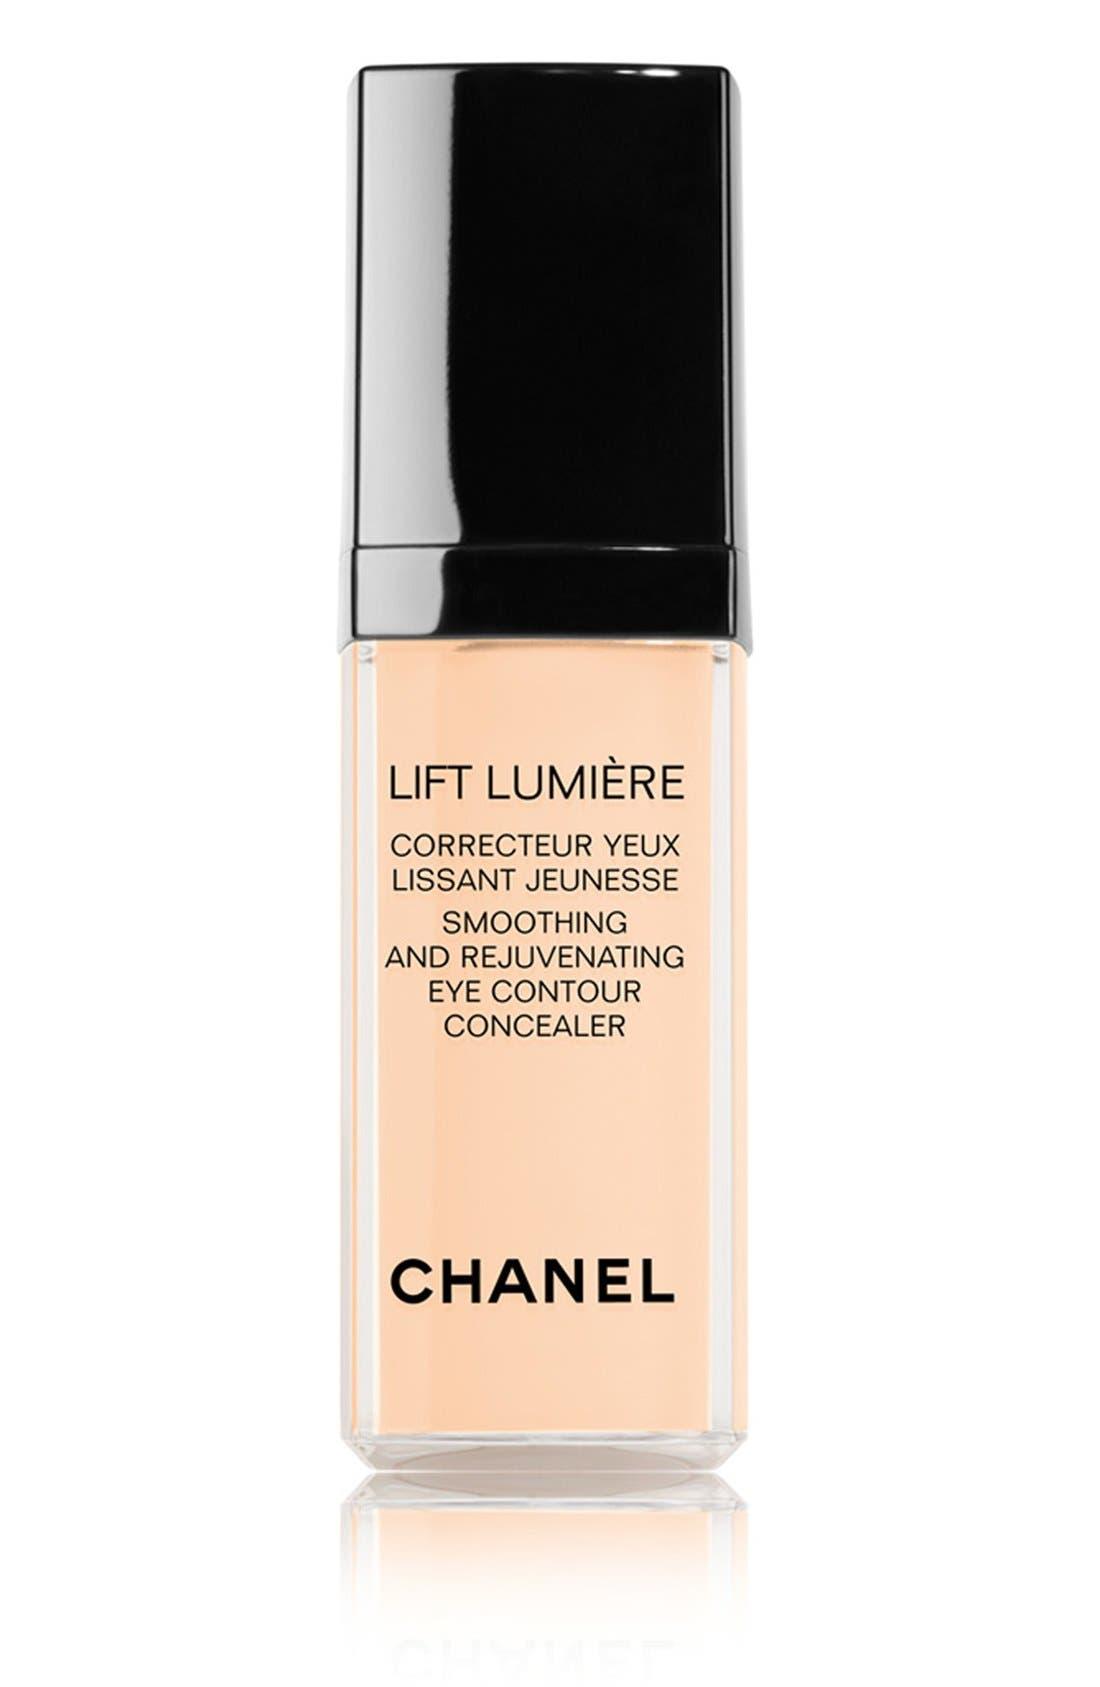 CHANEL LIFT LUMIÈRE  Smoothing & Rejuvenating Eye Contour Concealer